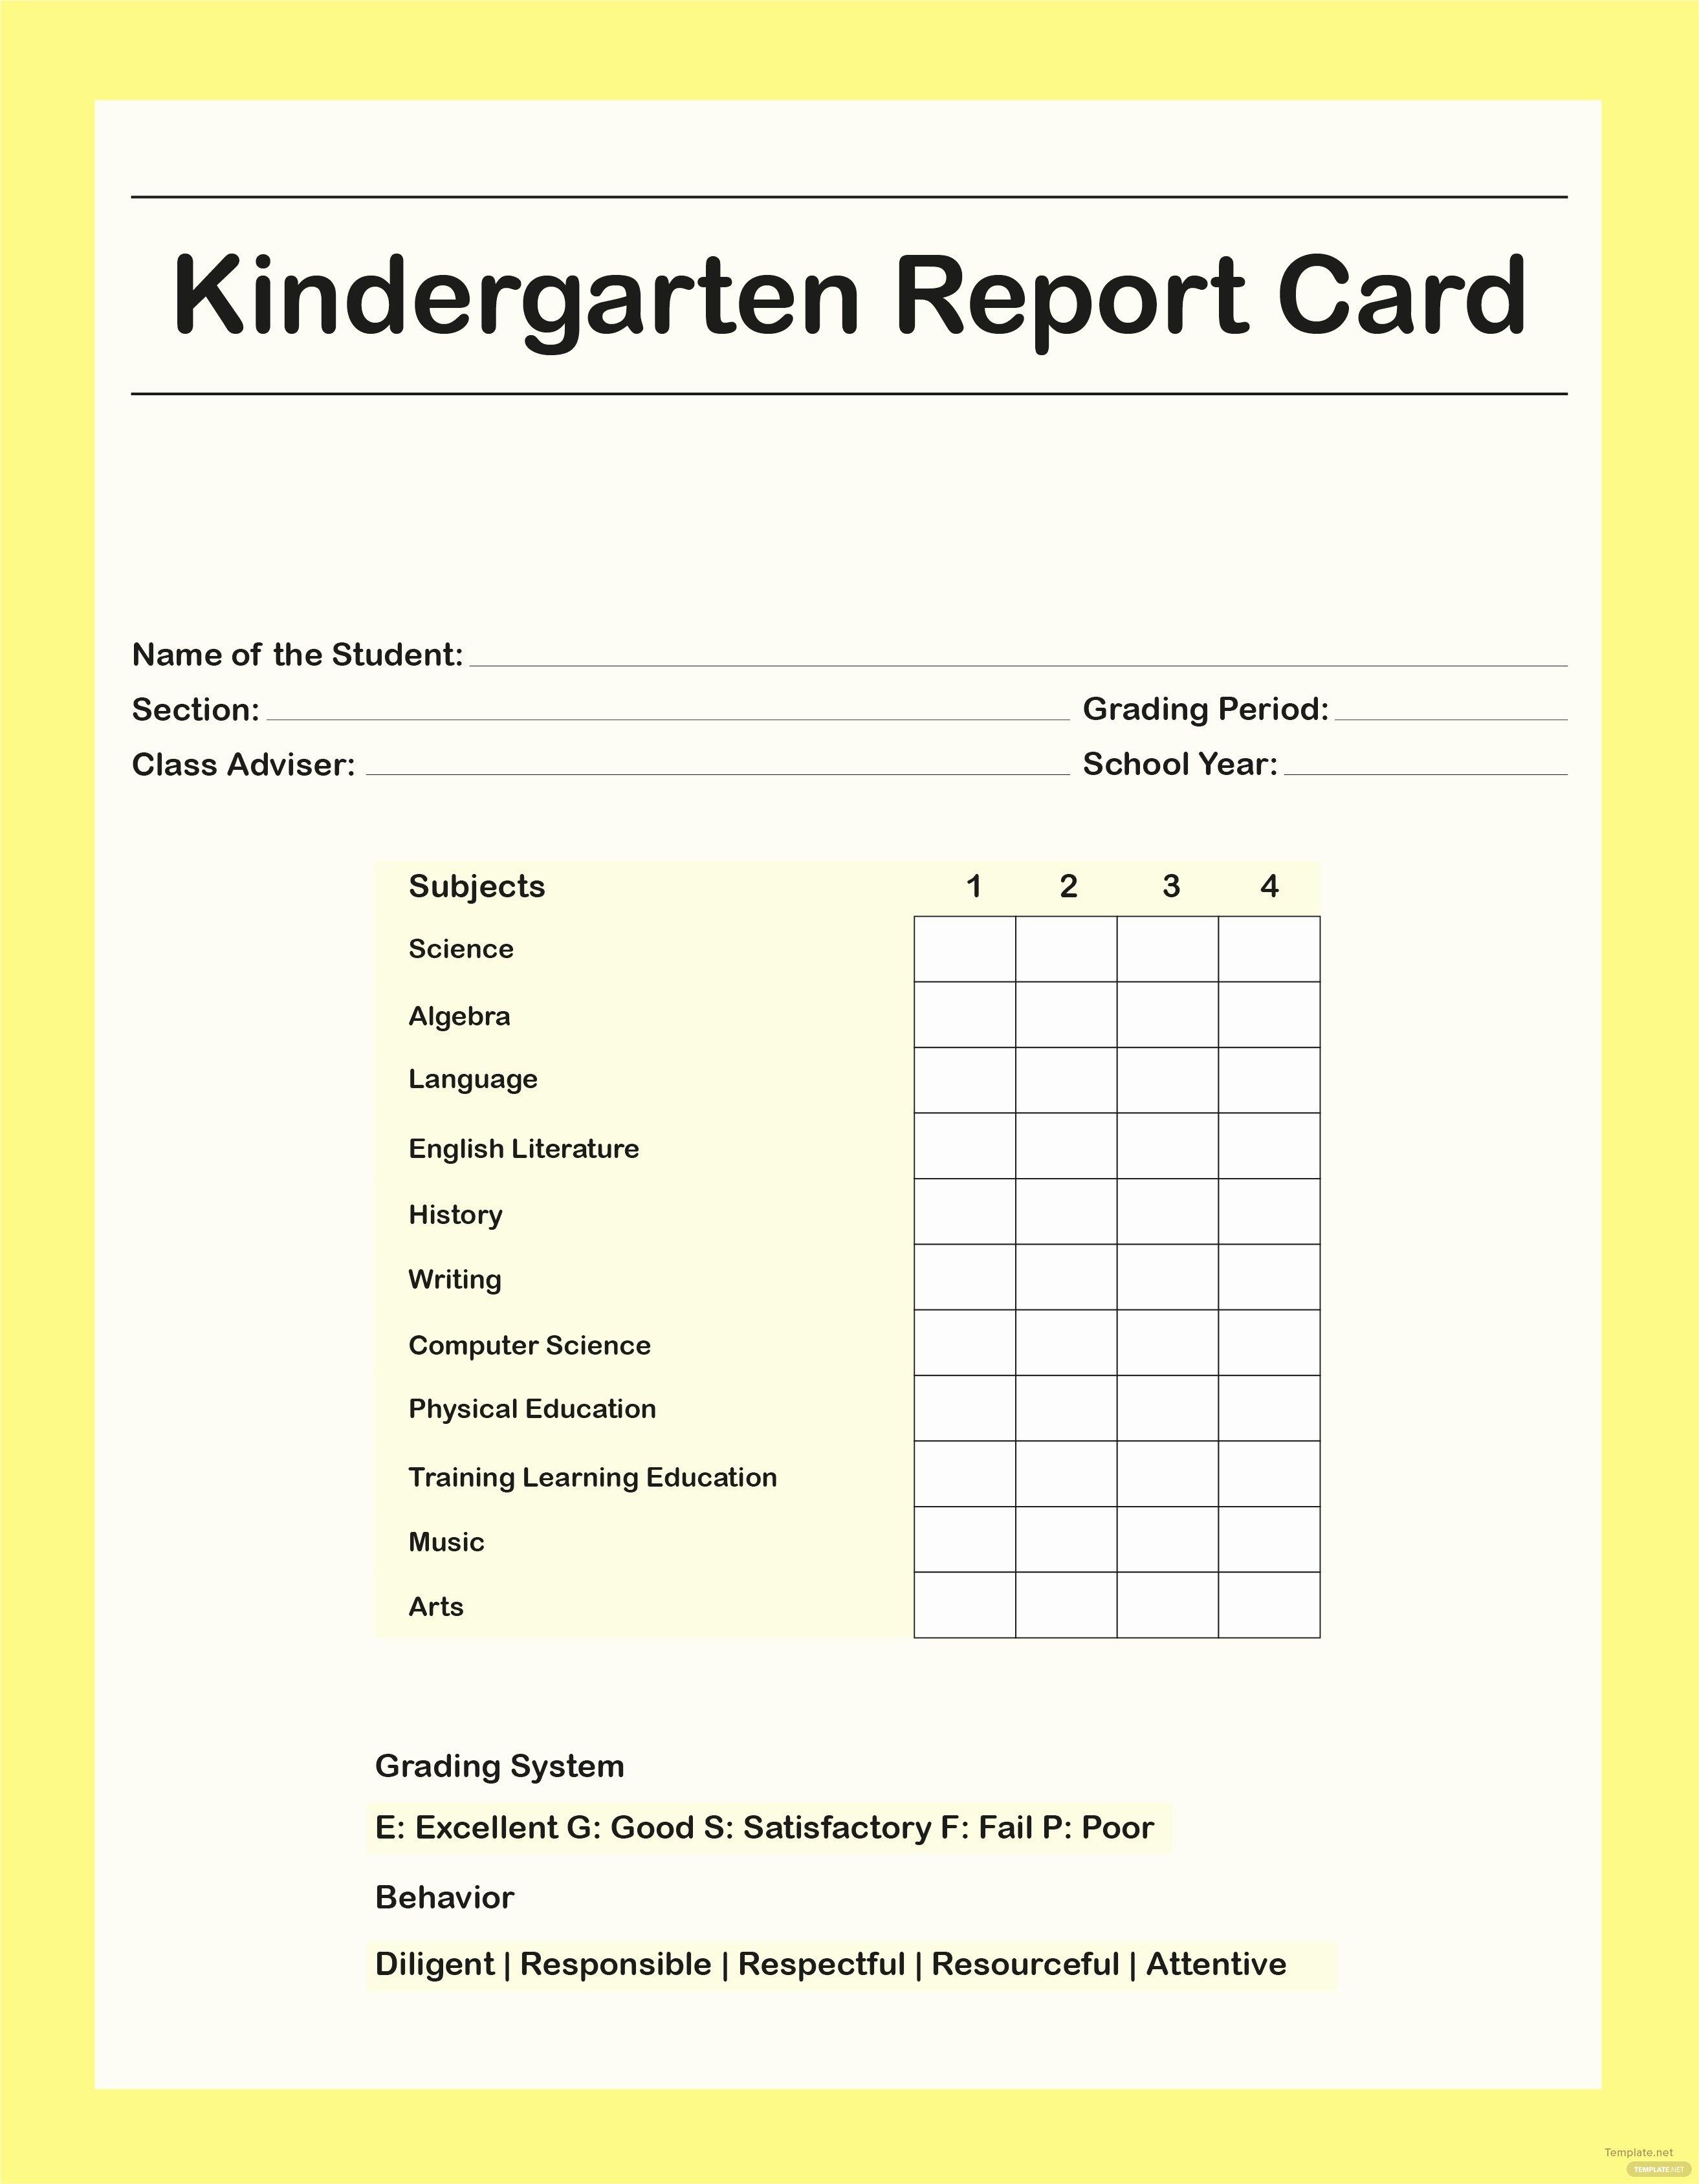 Free Report Card Template Blank Kindergarten Grooming | Meetpaulryan - Free Printable Kindergarten Report Cards